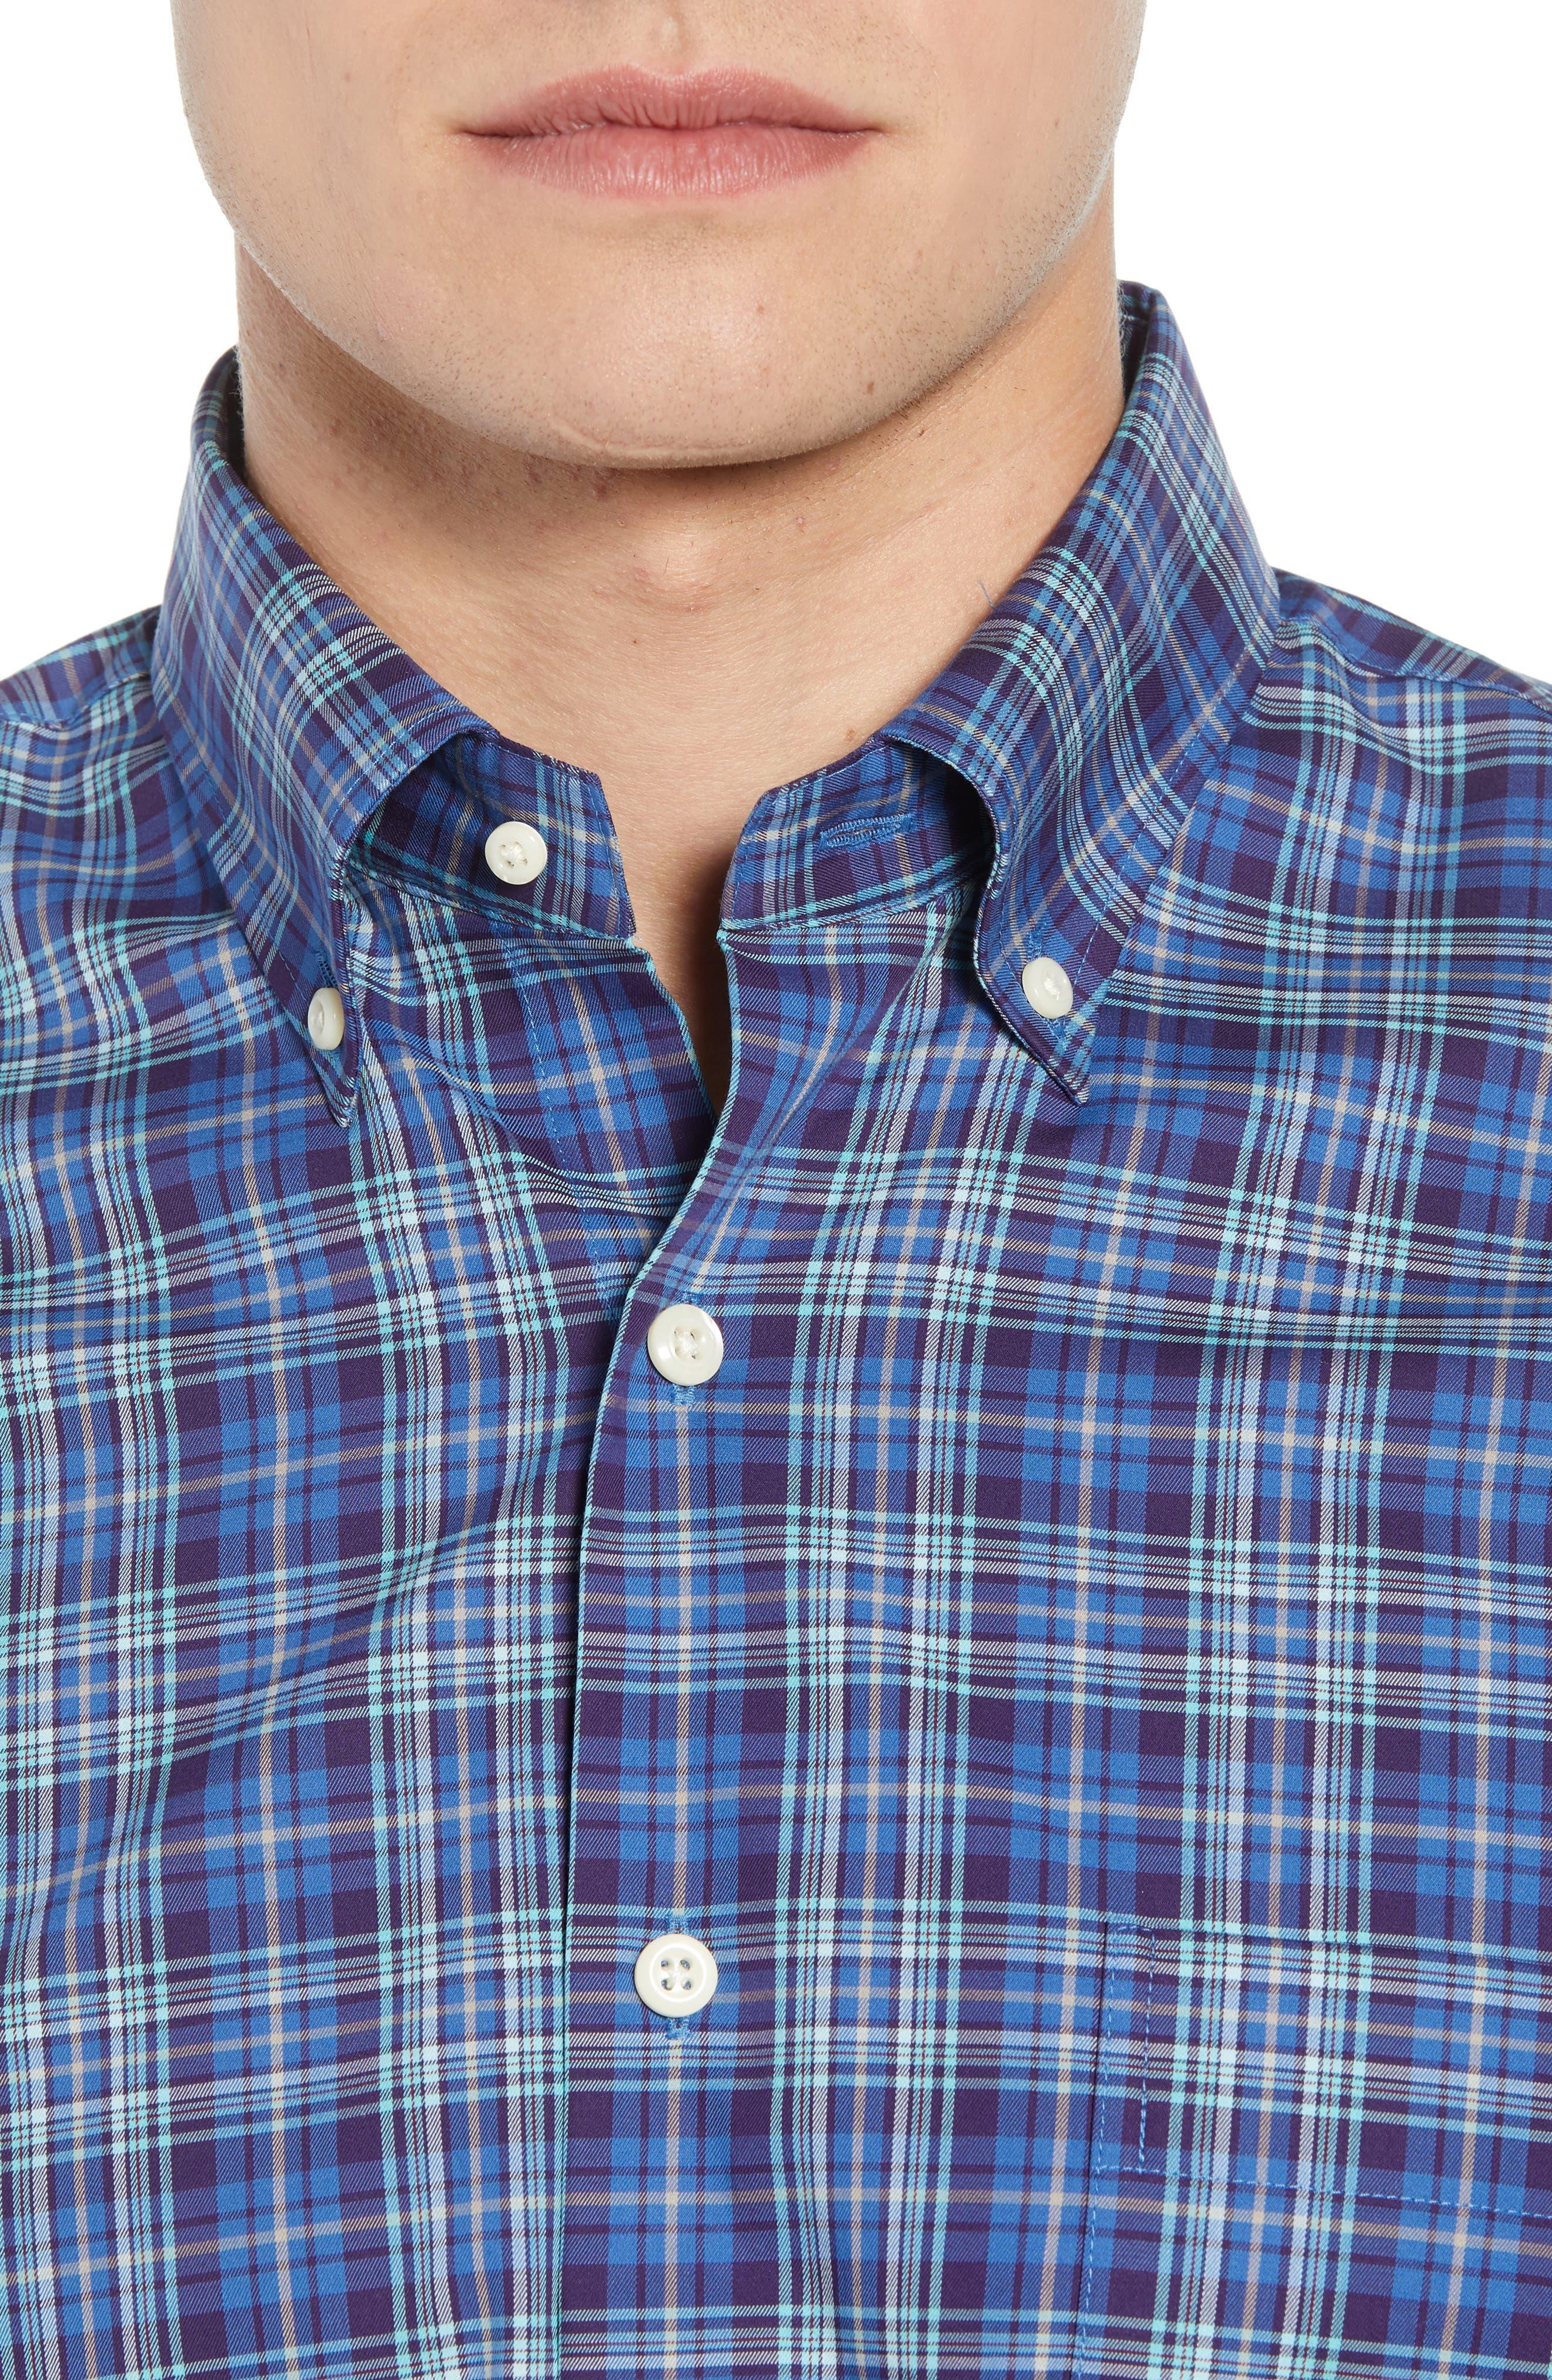 Crown Ease Flatey Island Regular Fit Tartan Plaid Sport Shirt,                             Alternate thumbnail 2, color,                             BLUE